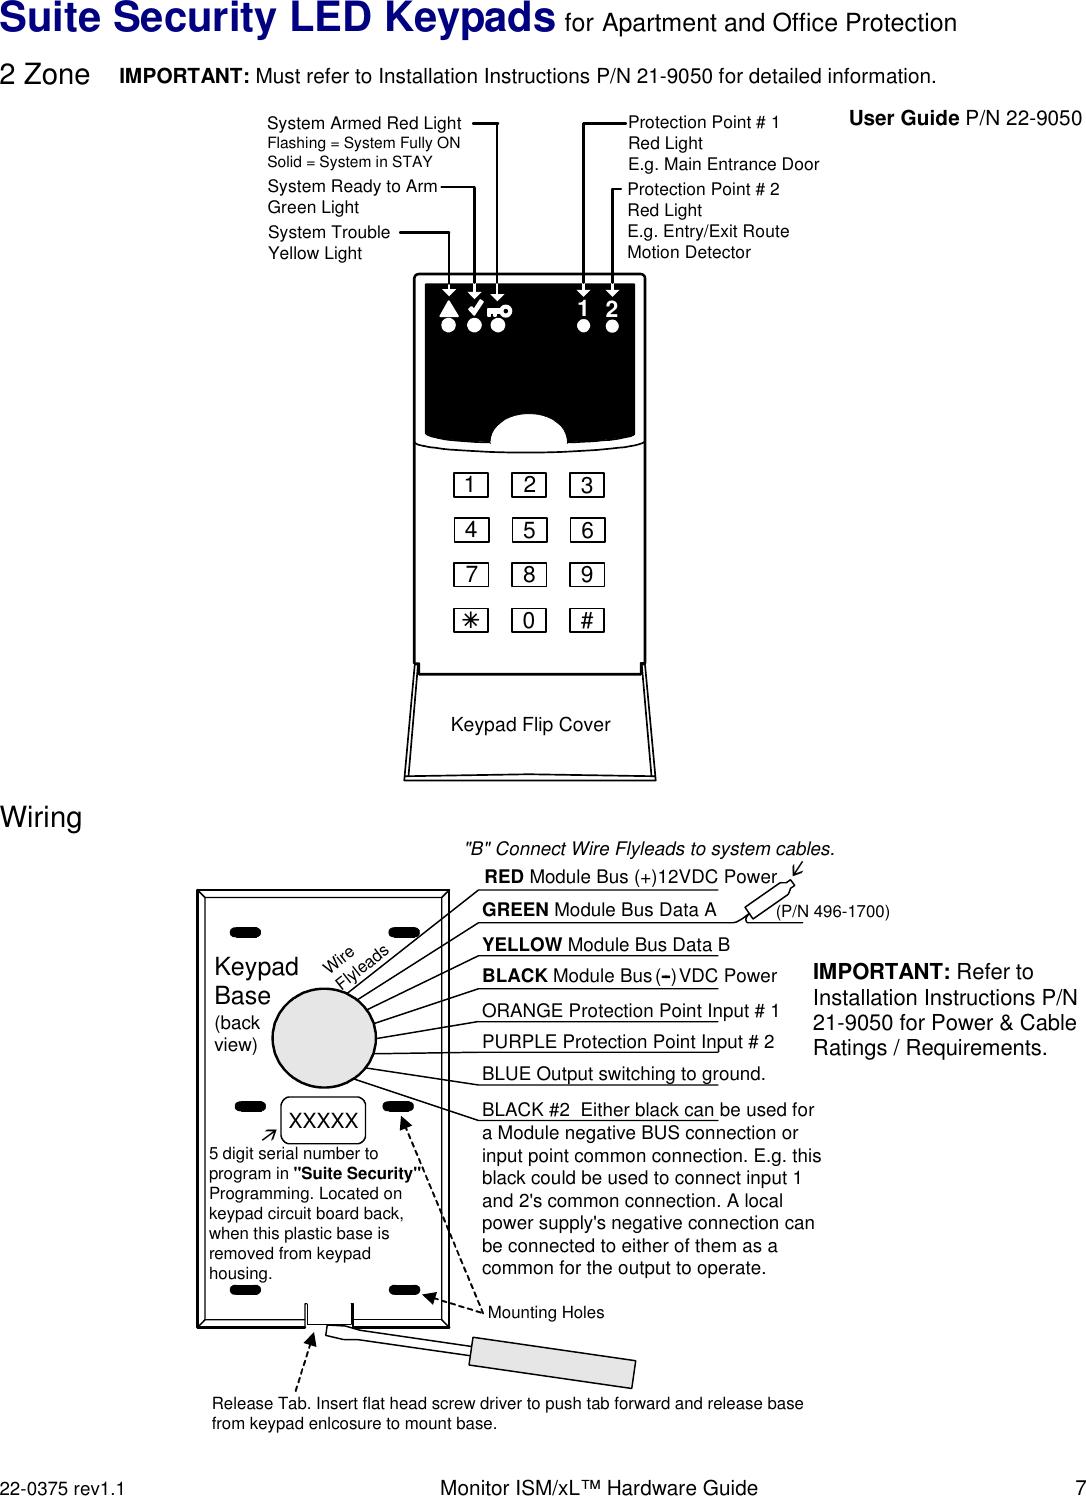 Monitor ISM/xL™ Hardware Guide 22 0375v1 1 ISM x L Hrdwr Gd9 06 on